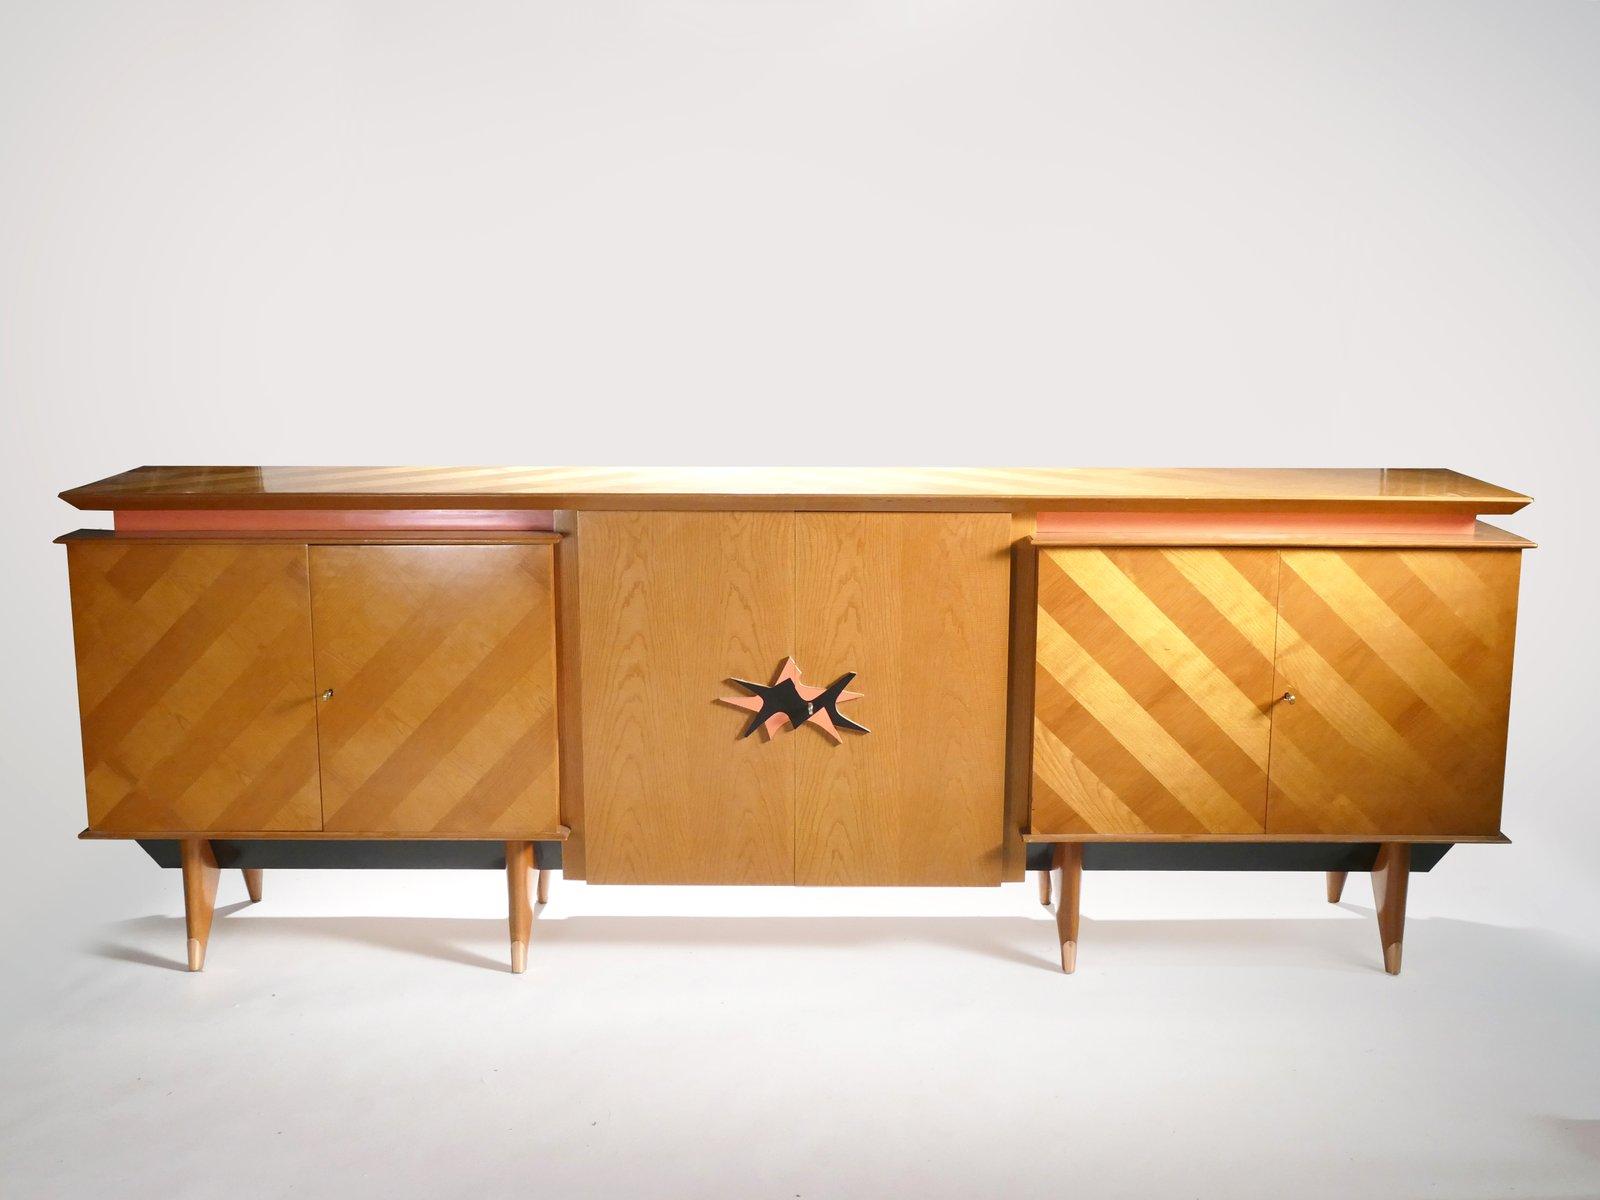 Großes Modernes Sideboard in Kirsche, 1950er